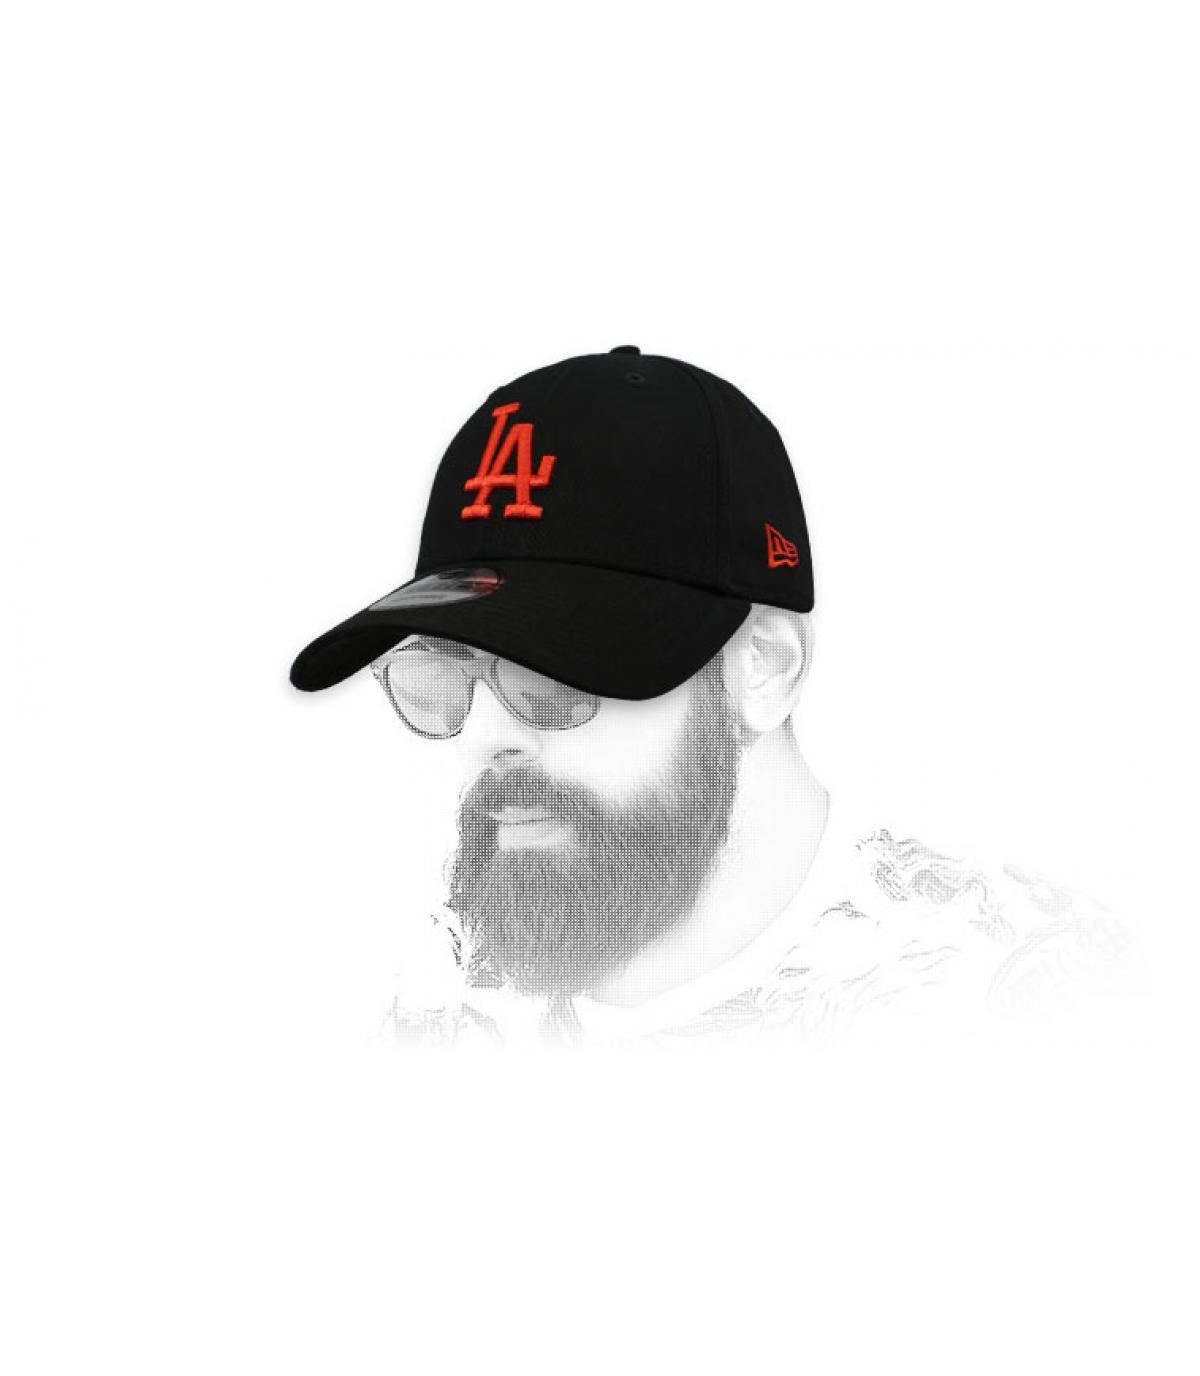 black red LA cap